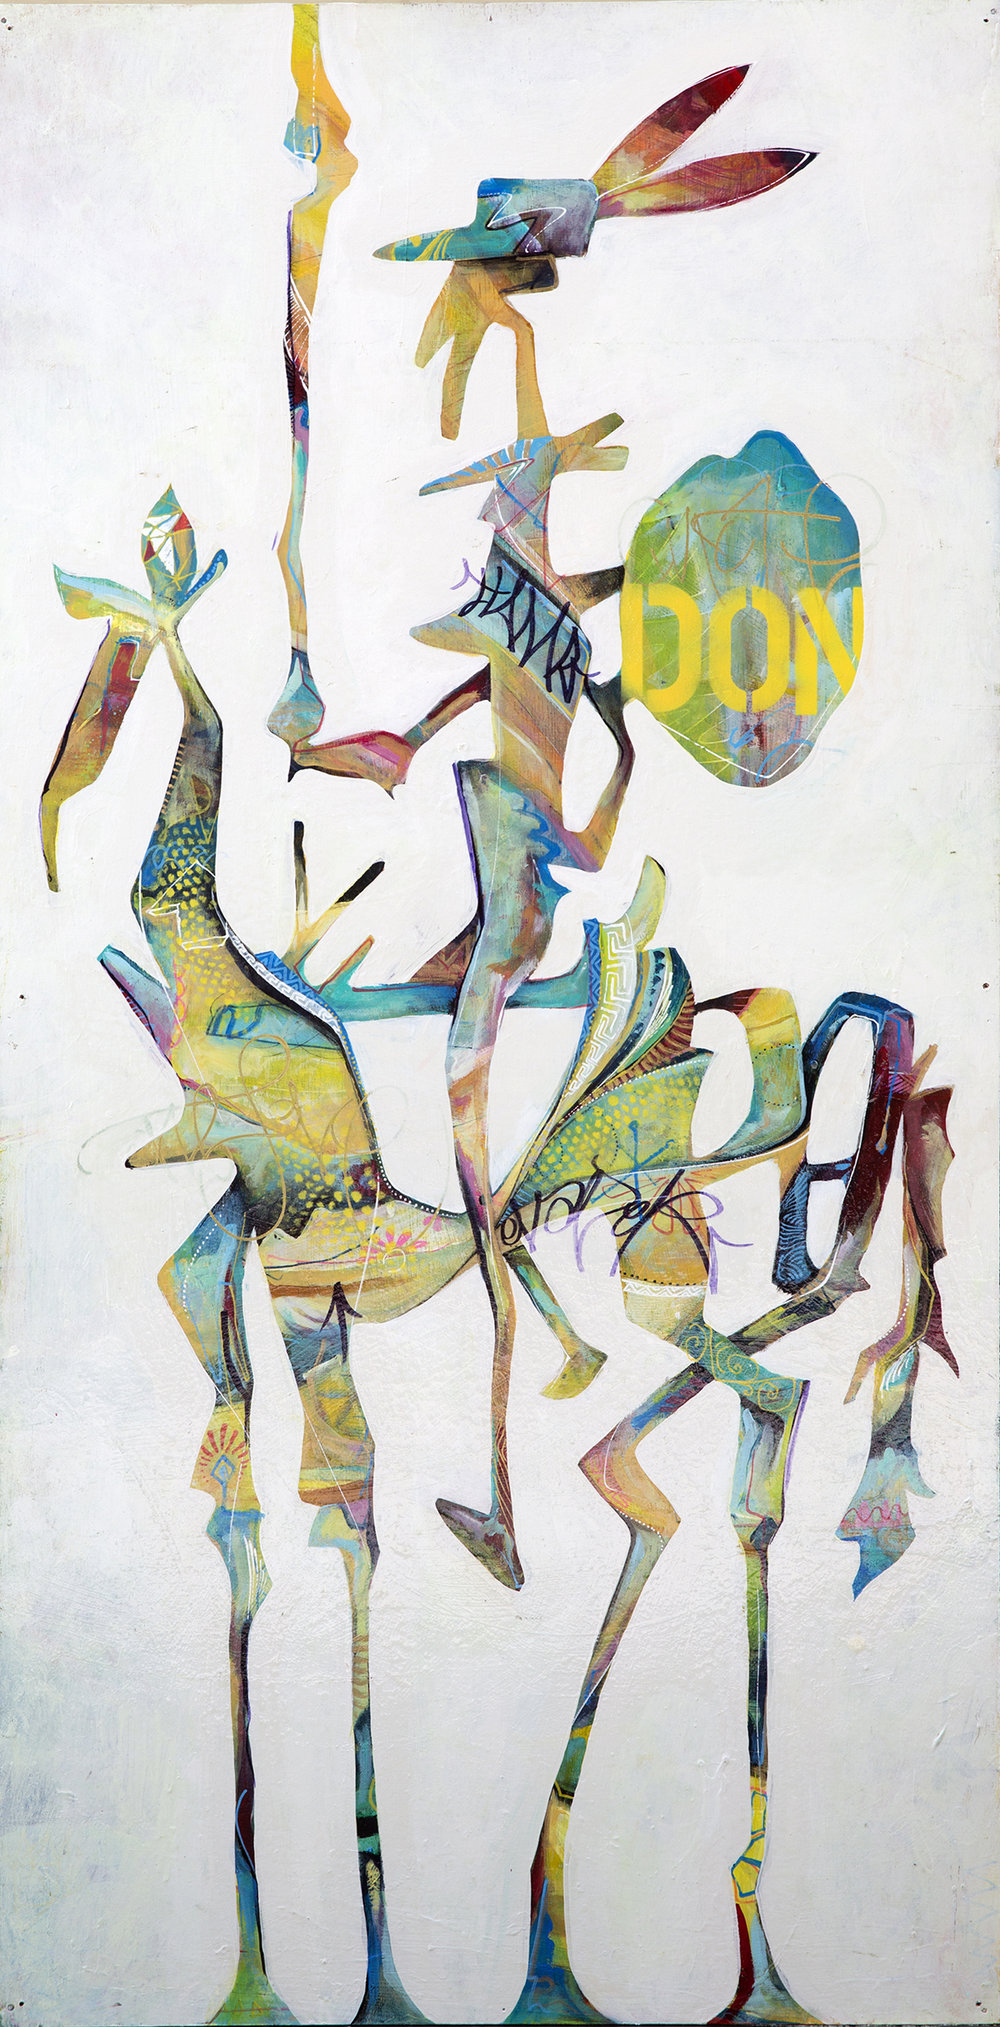 'Don Quixote' Acrylic on wood. 48h x 22w. 2015